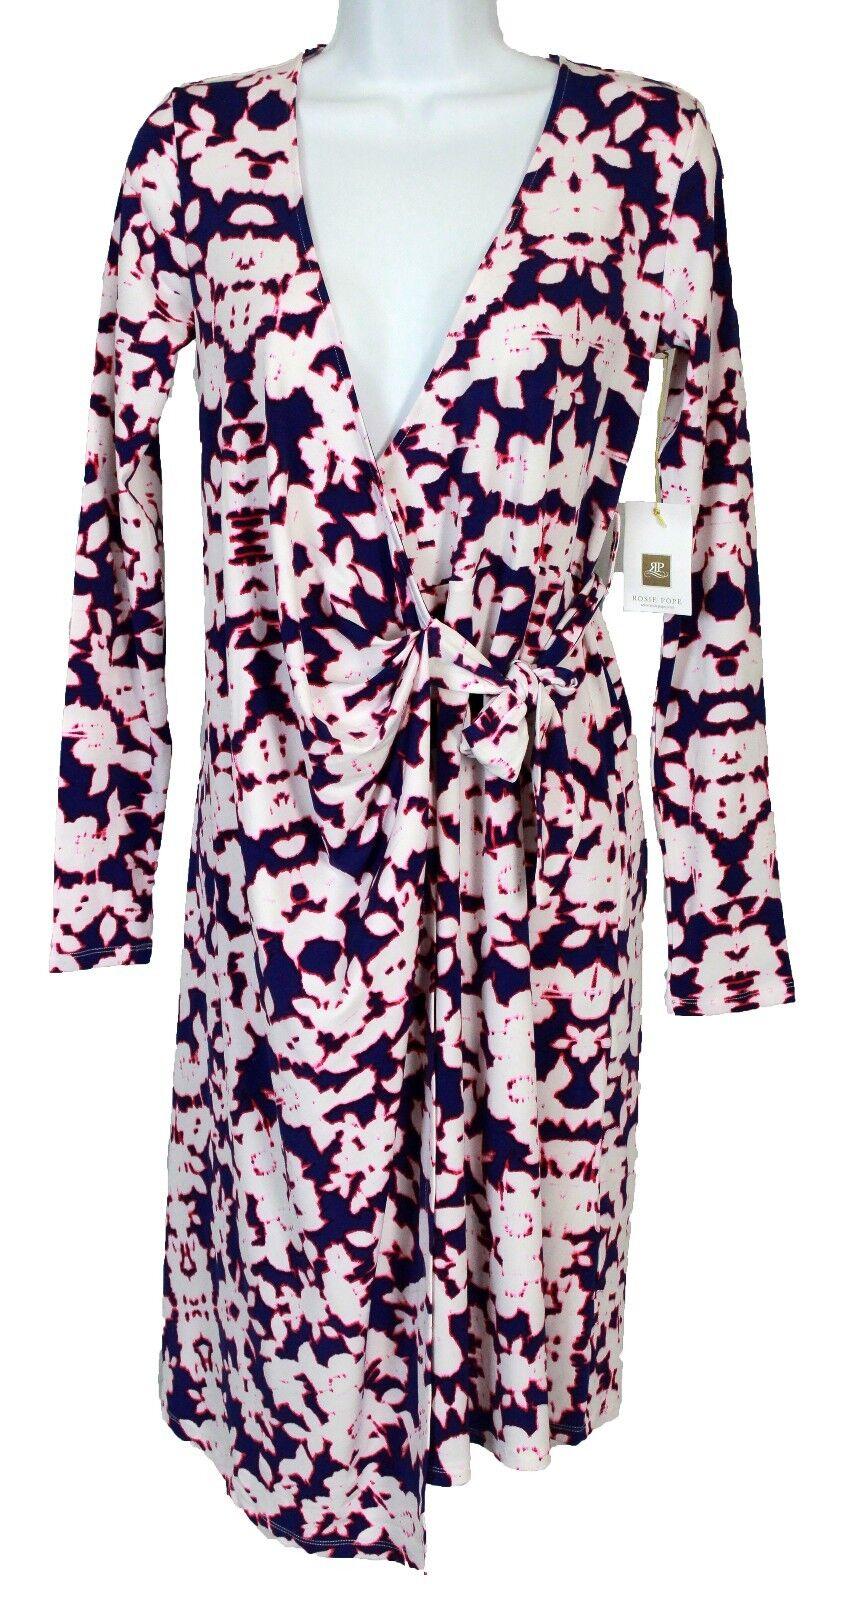 Rosie Pope Women's Maternity Wrap Long Sleeved Knee Length Dress, Deep Iris, XS